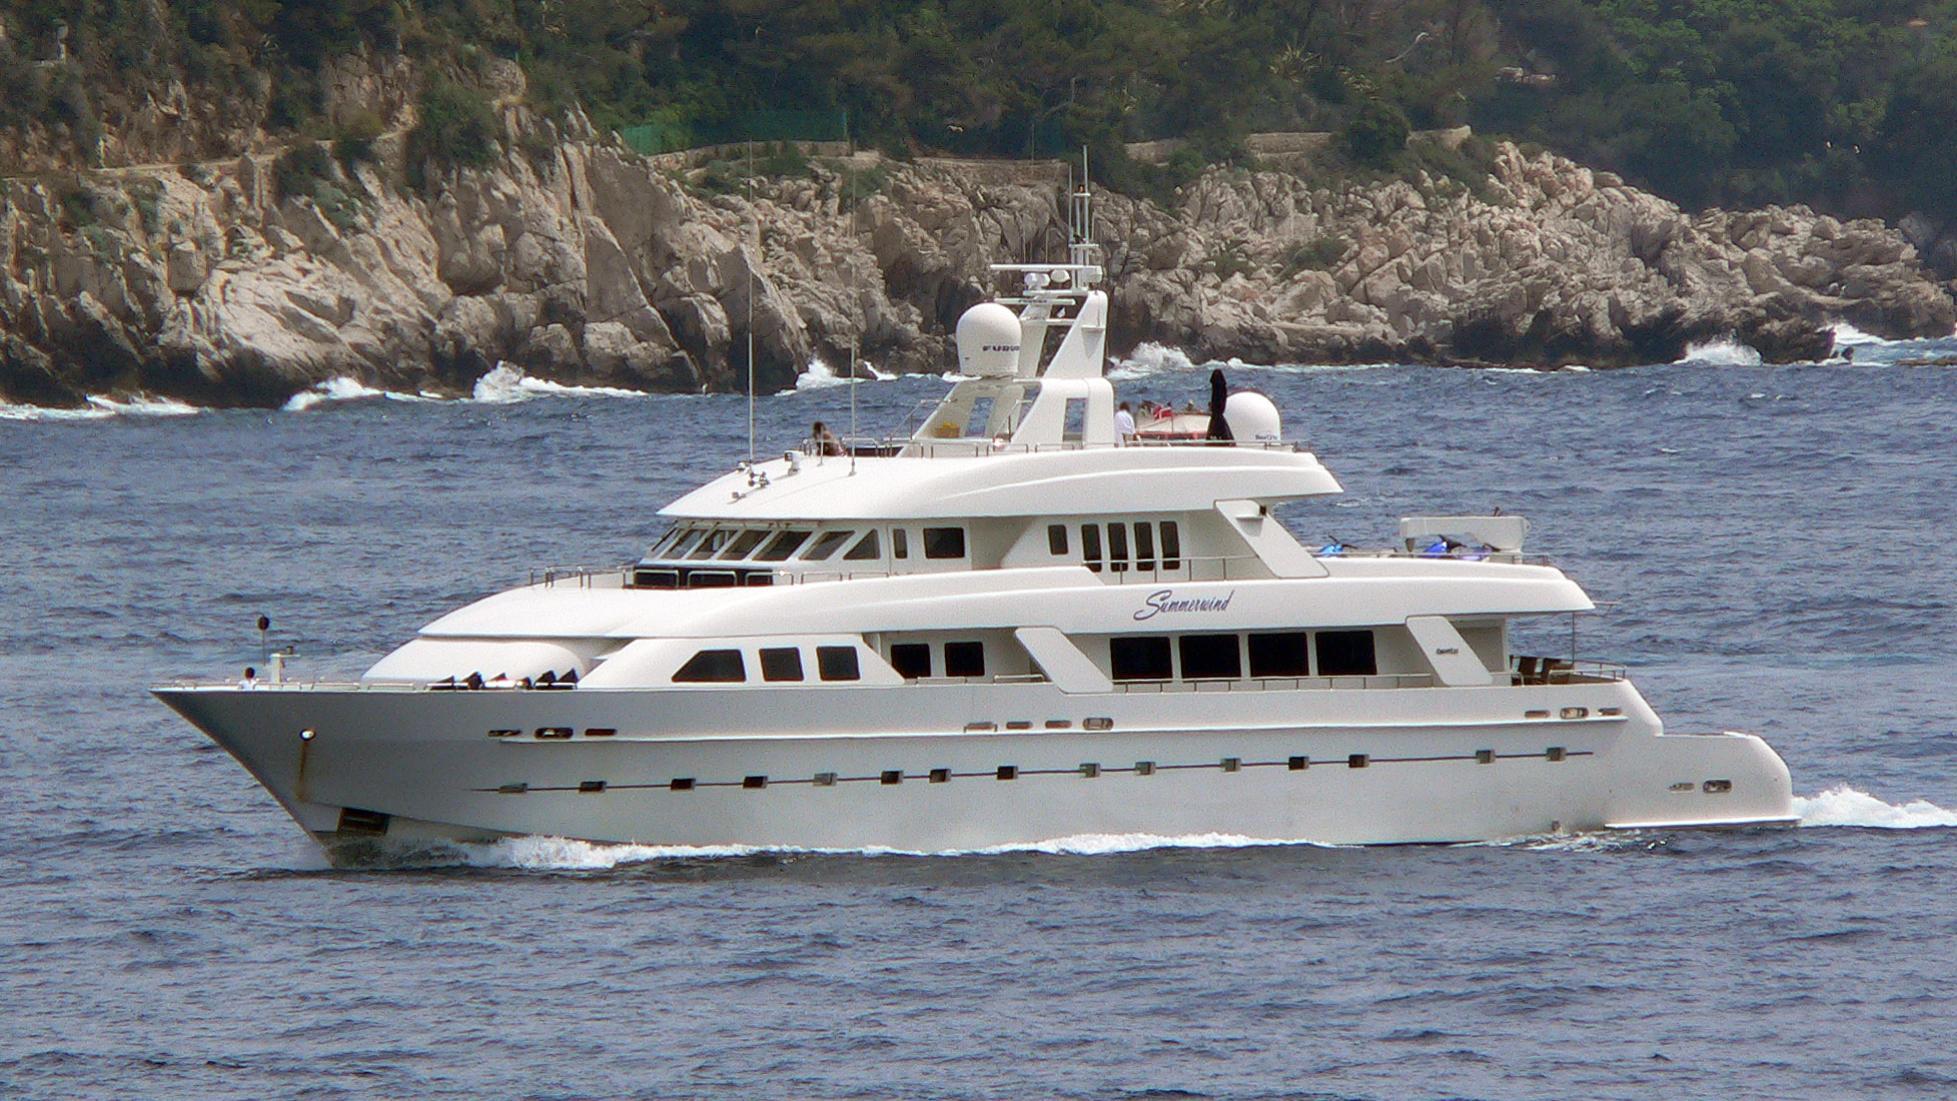 island-heiress-motor-yacht-cheoy-lee-global-145-1996-44m-profile-cruising